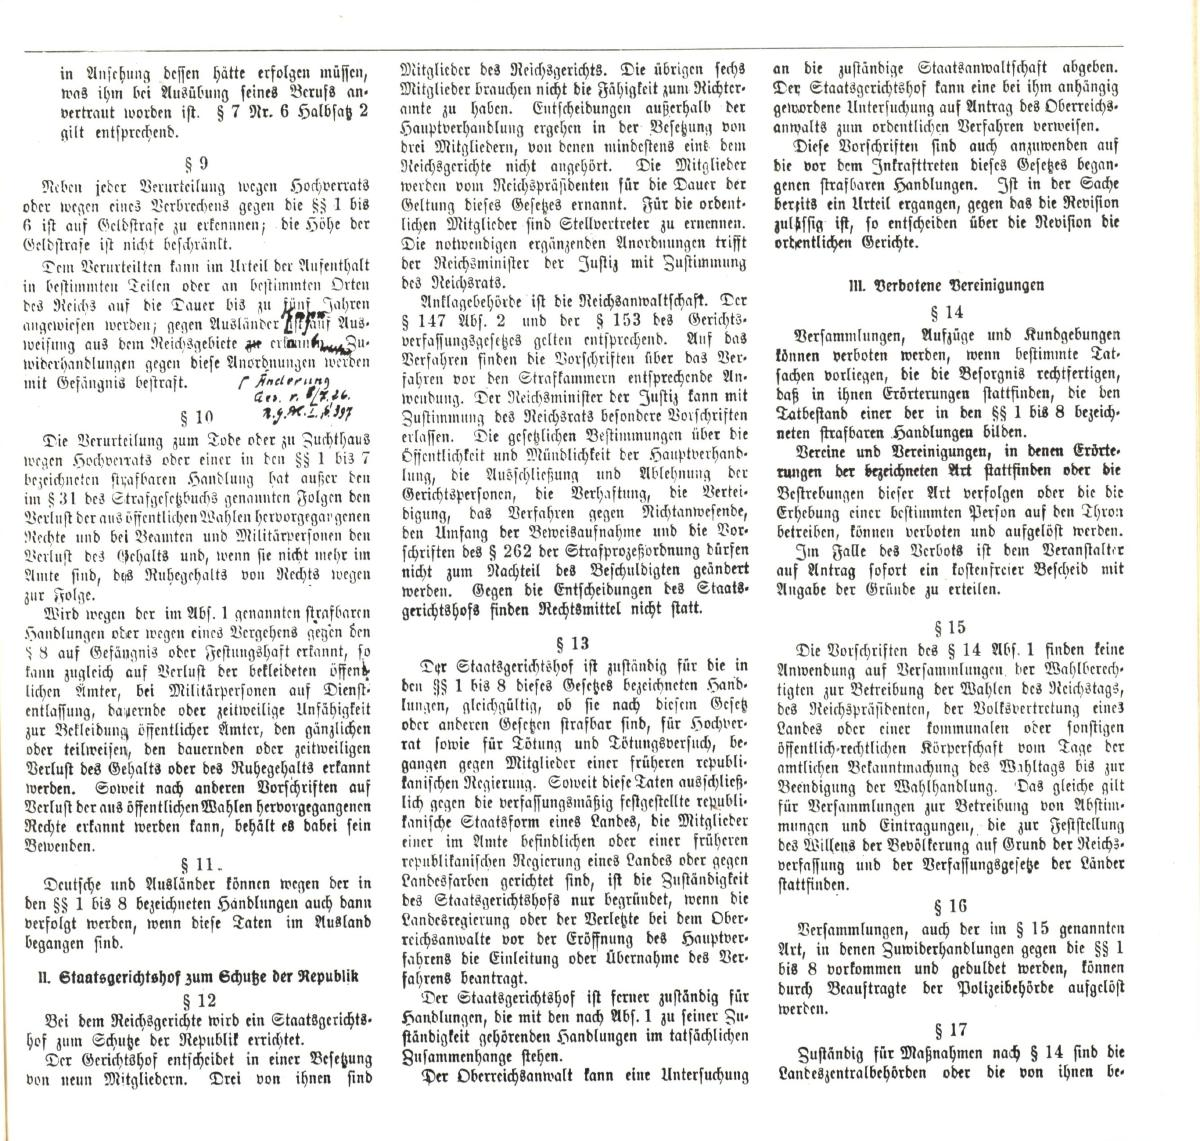 REP_VLB_1976_Die_Zensurgesetze_36